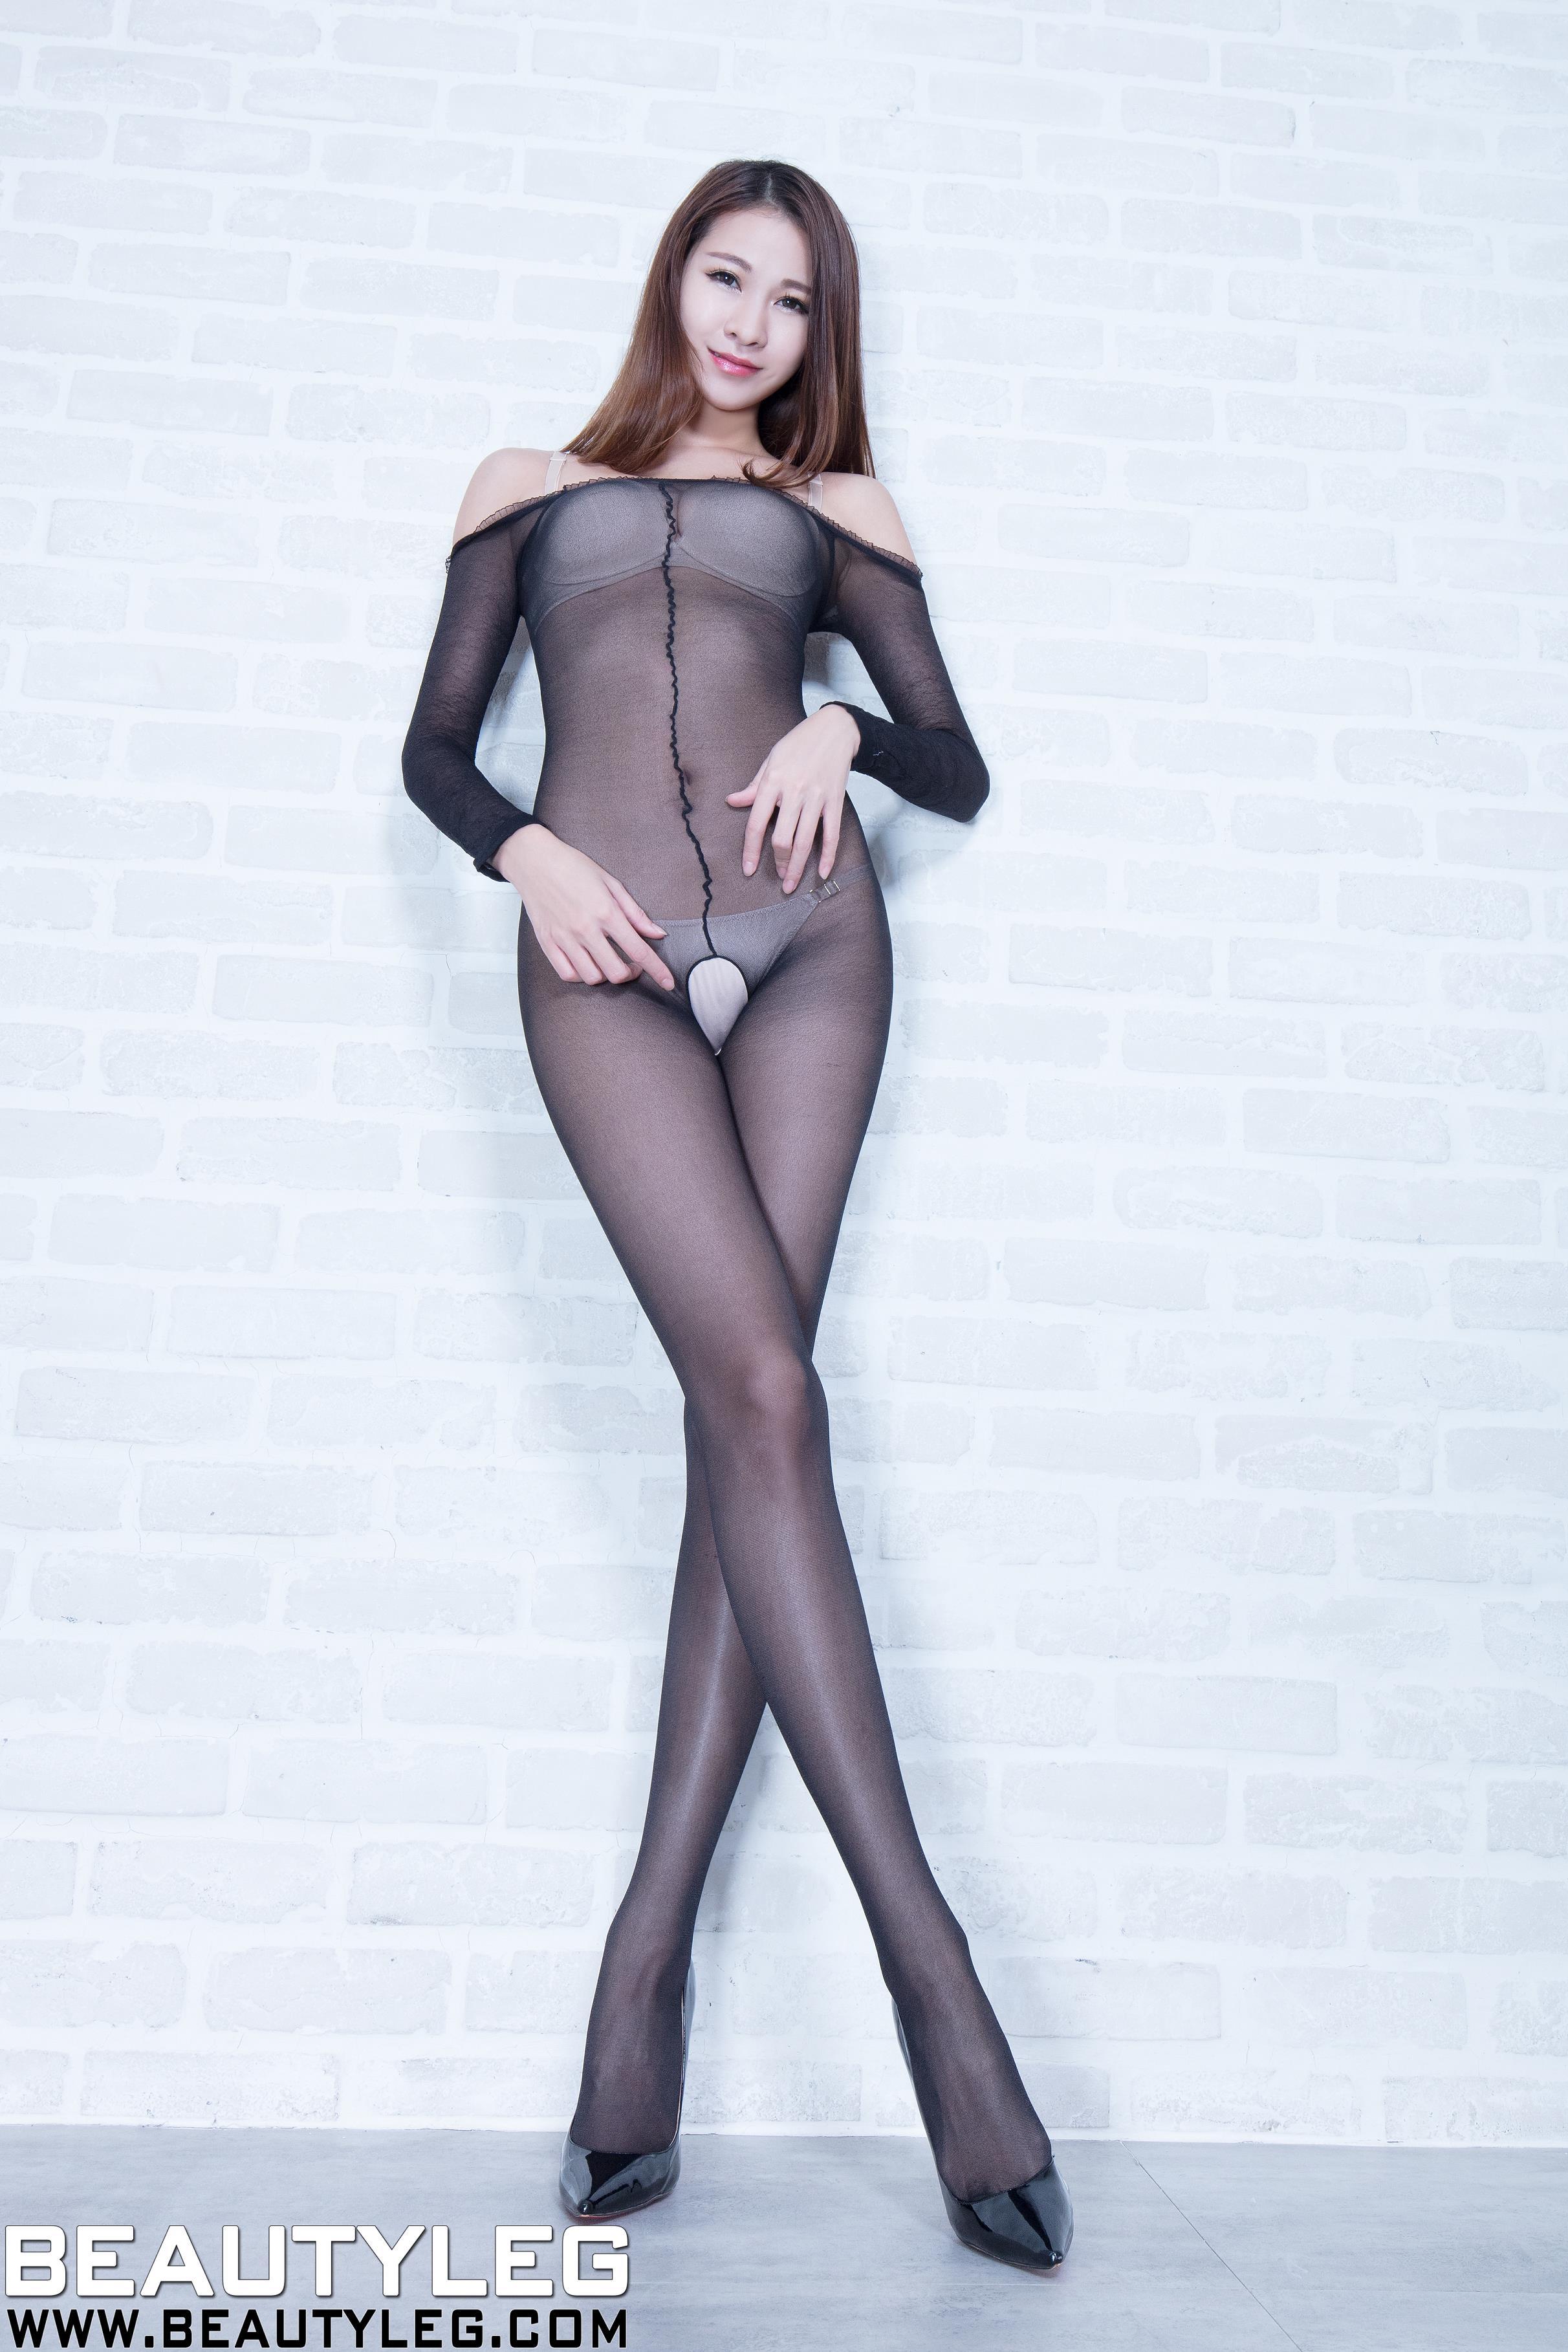 [beautyleg美腿写真]No.1615 Neko 性感内衣与黑色连身情趣开裆丝袜私房写真集